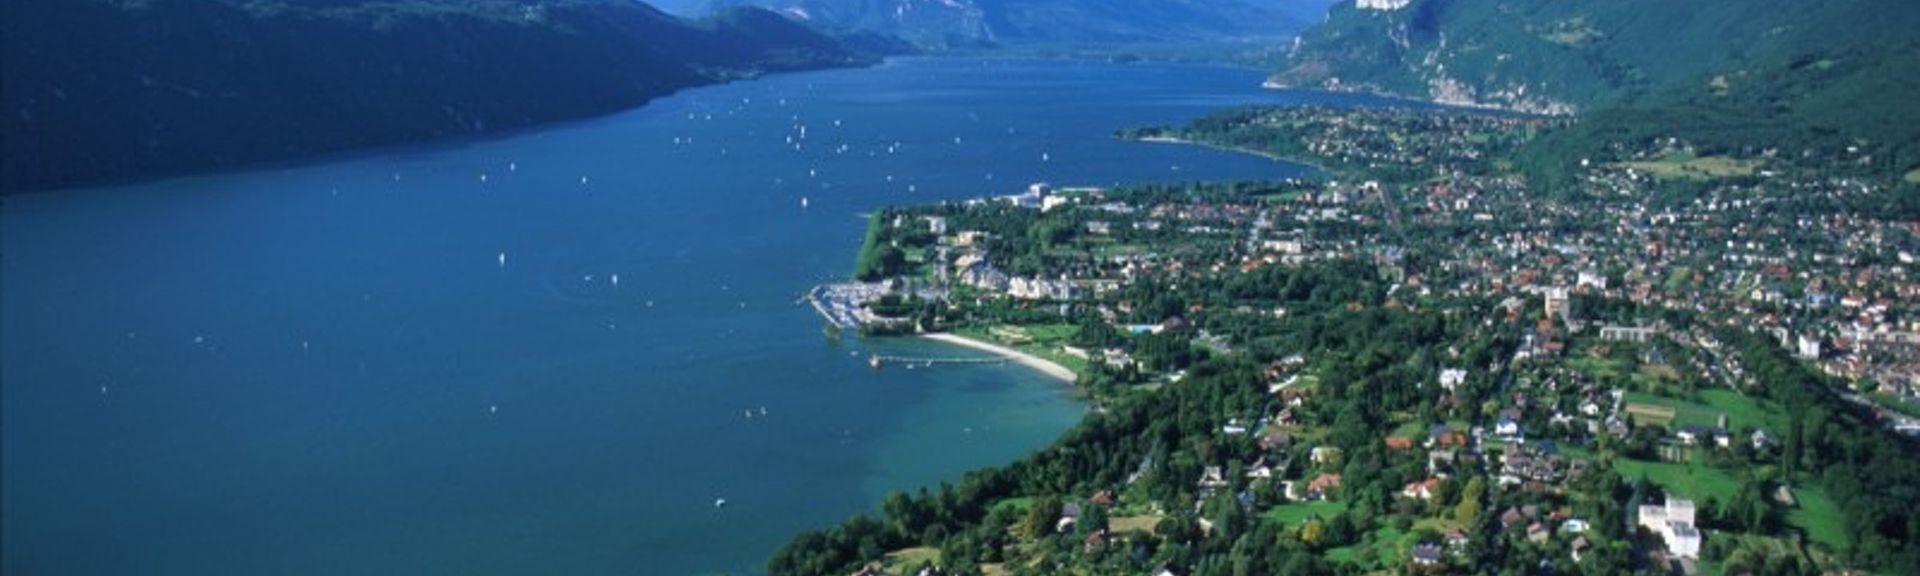 Giez-Lac d'Annecy Golf, Giez, Auvergne-Rhône-Alpes, France